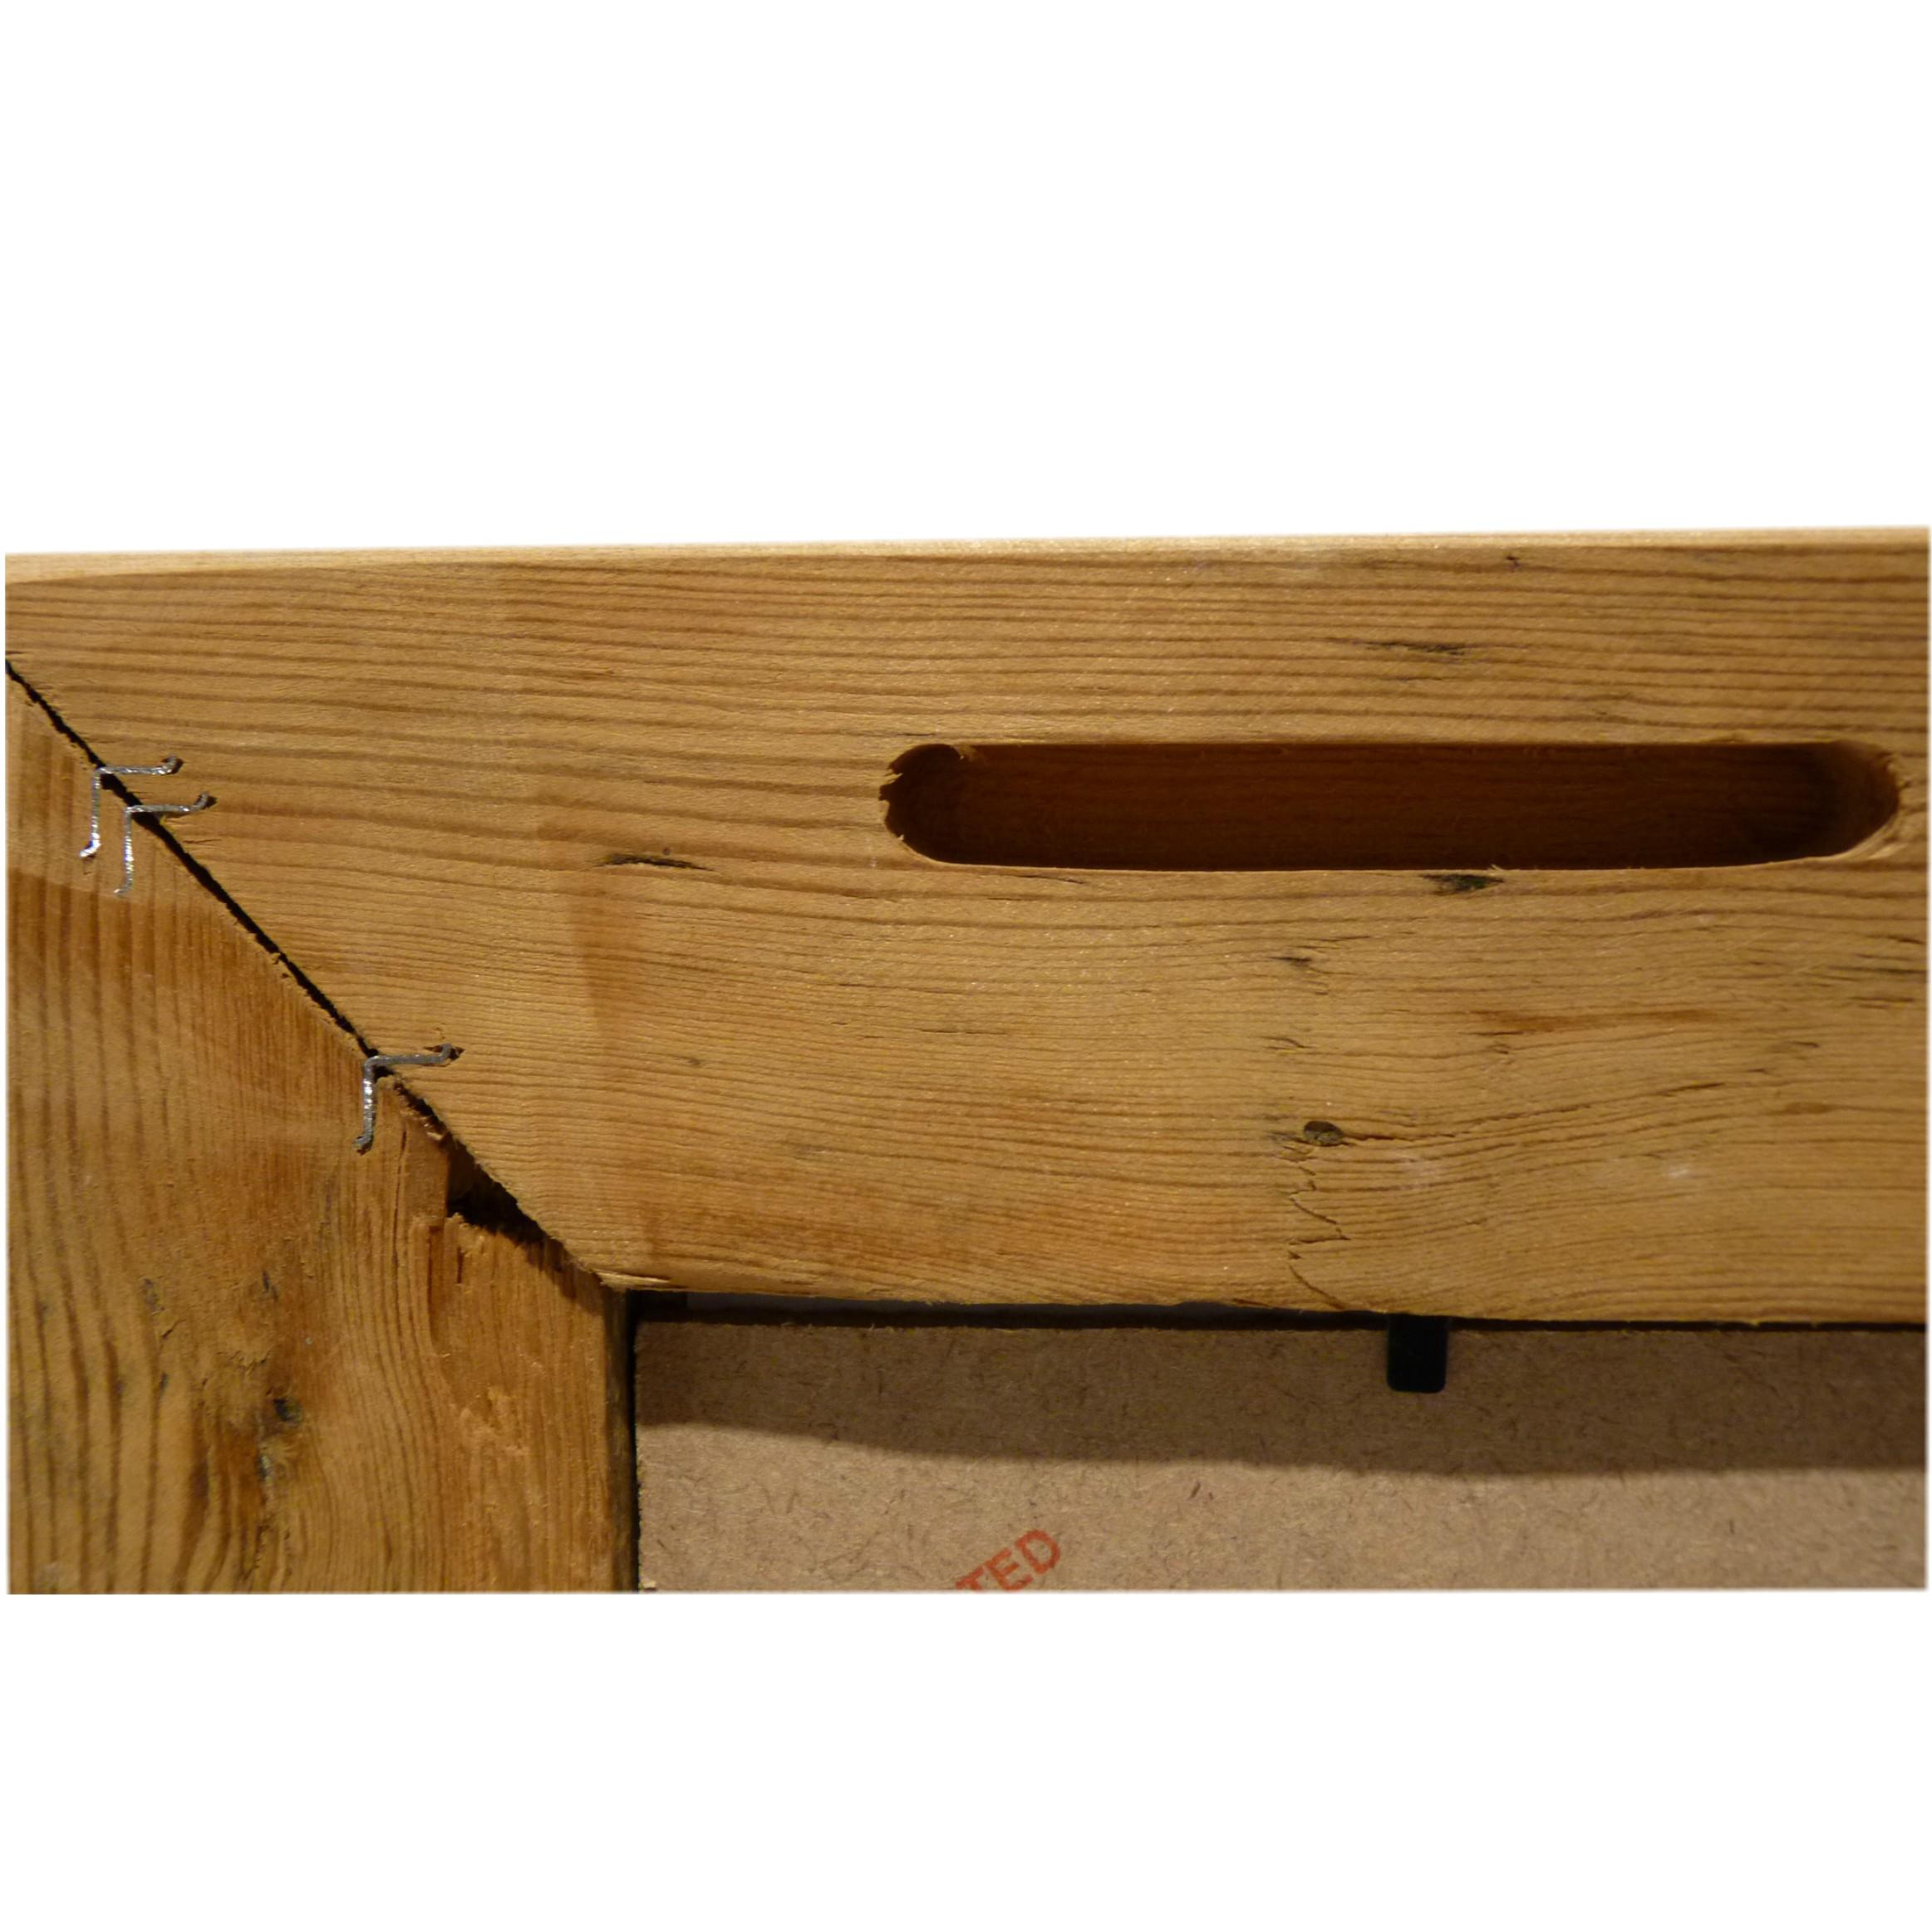 Bilderrahmen Holz Recycling ~ Bilderrahmen Shabby Vintage Rahmen Holzrahmen Recycling Holzrahmen